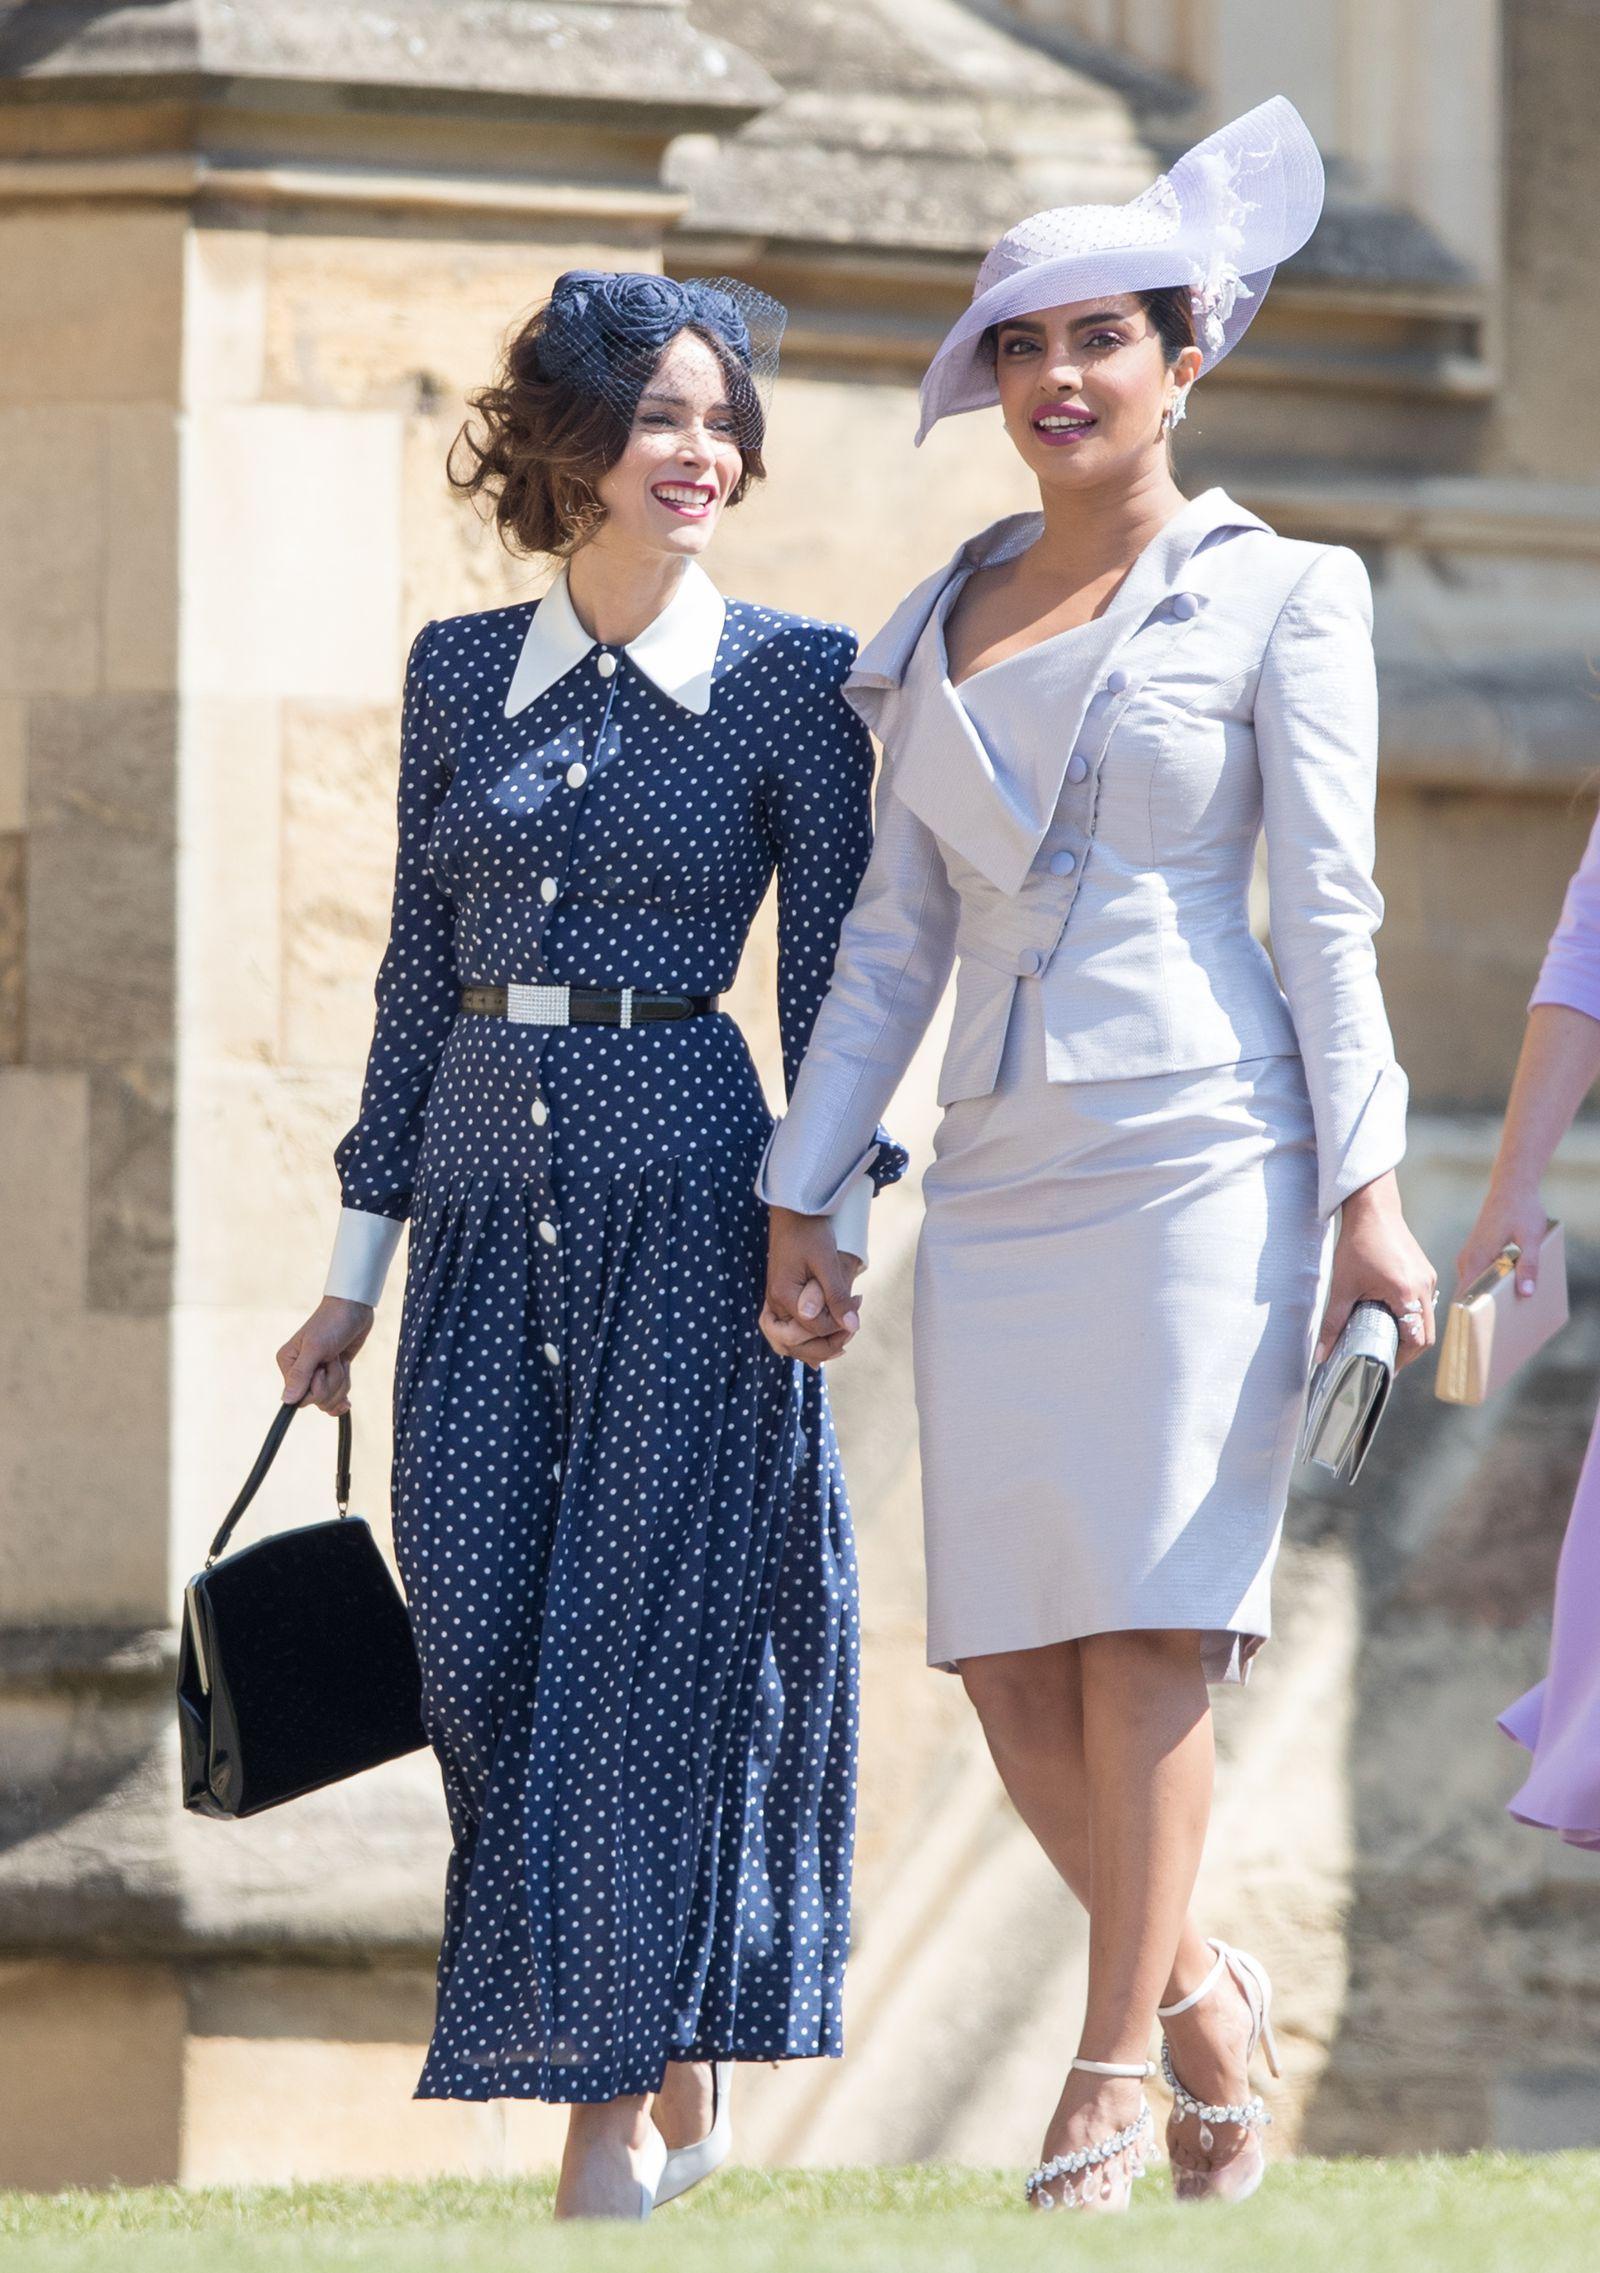 86ab459ba79 Kate Middleton Wore the Same Polka Dot Dress as a Royal Wedding Guest-  HarpersBAZAAR.com